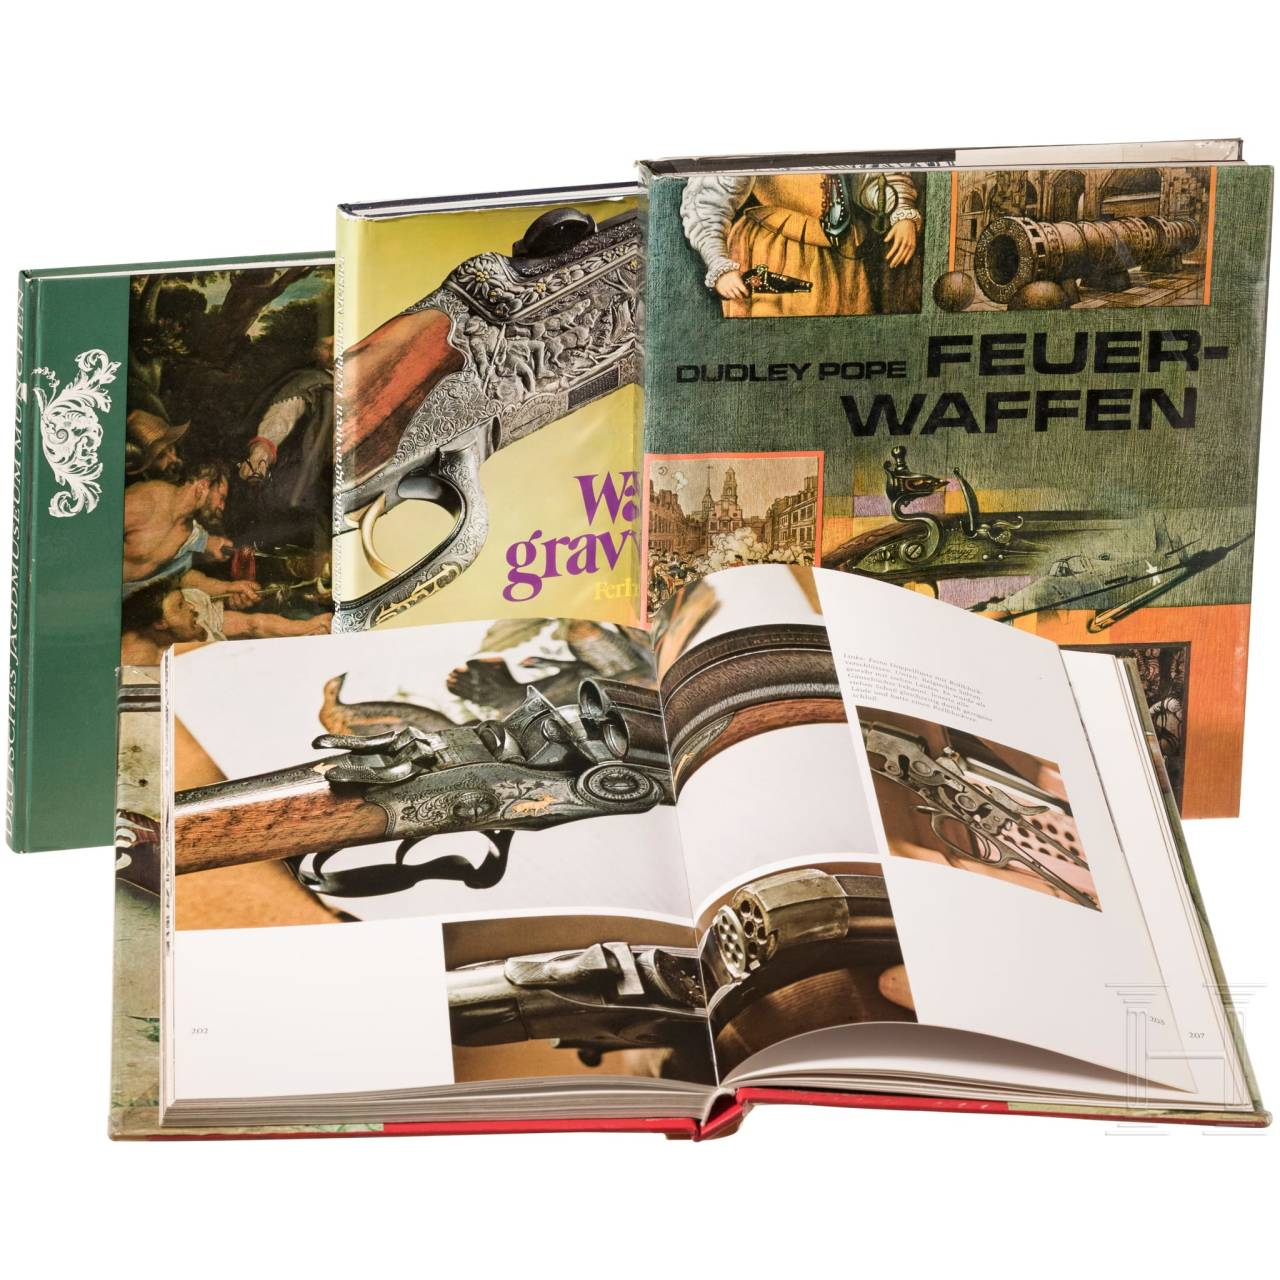 Four books on firearms